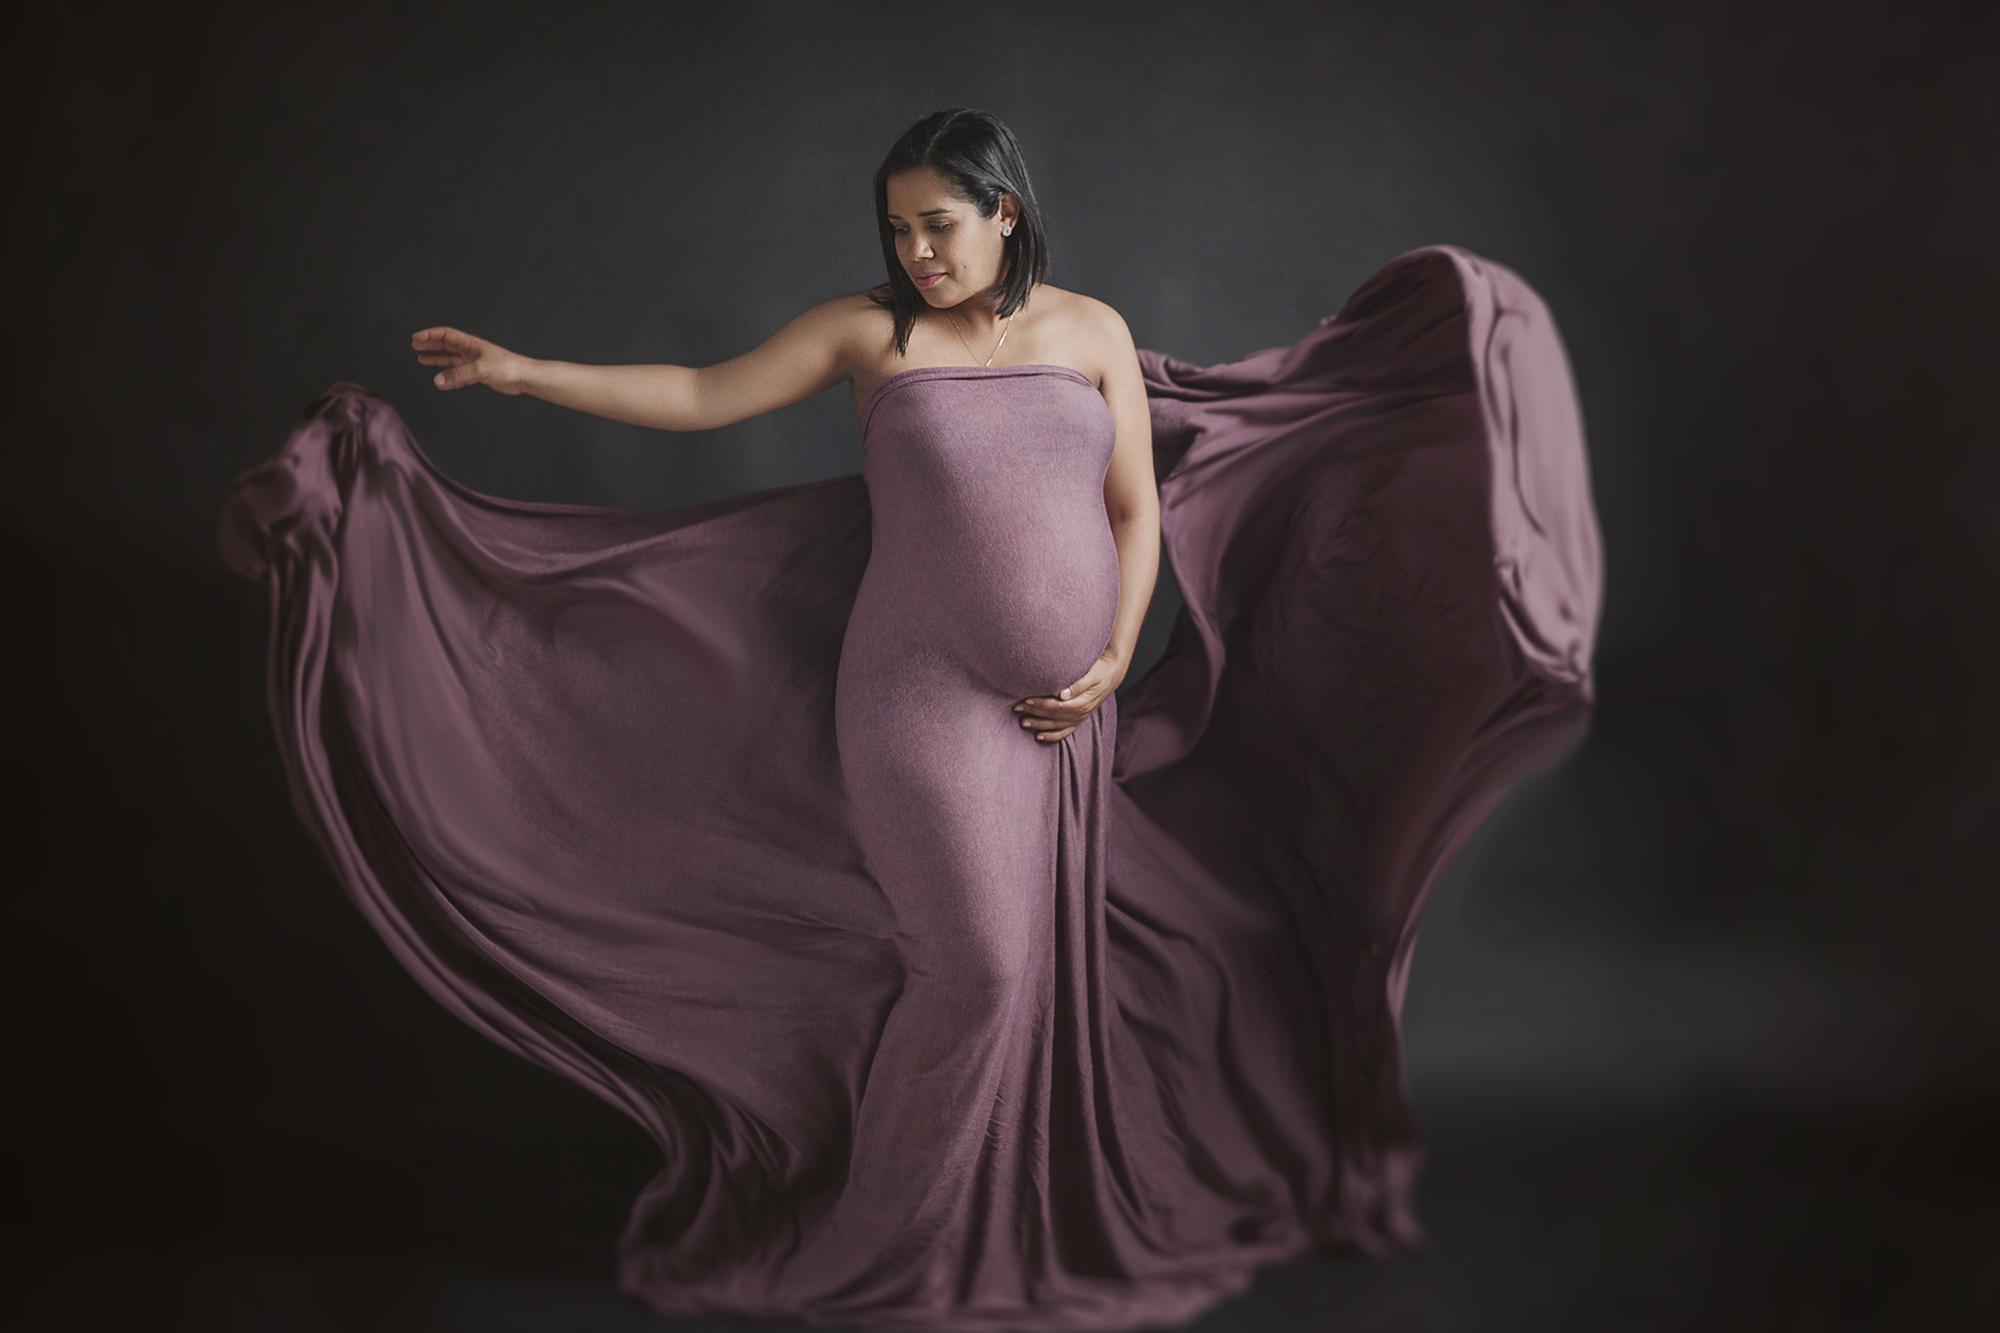 larga espera, embarazo de 9 meses, sesión de embarazo es estudio en zaragoza, sesión de embarazo en exterior en zaragoza, foto de embarazo de familia